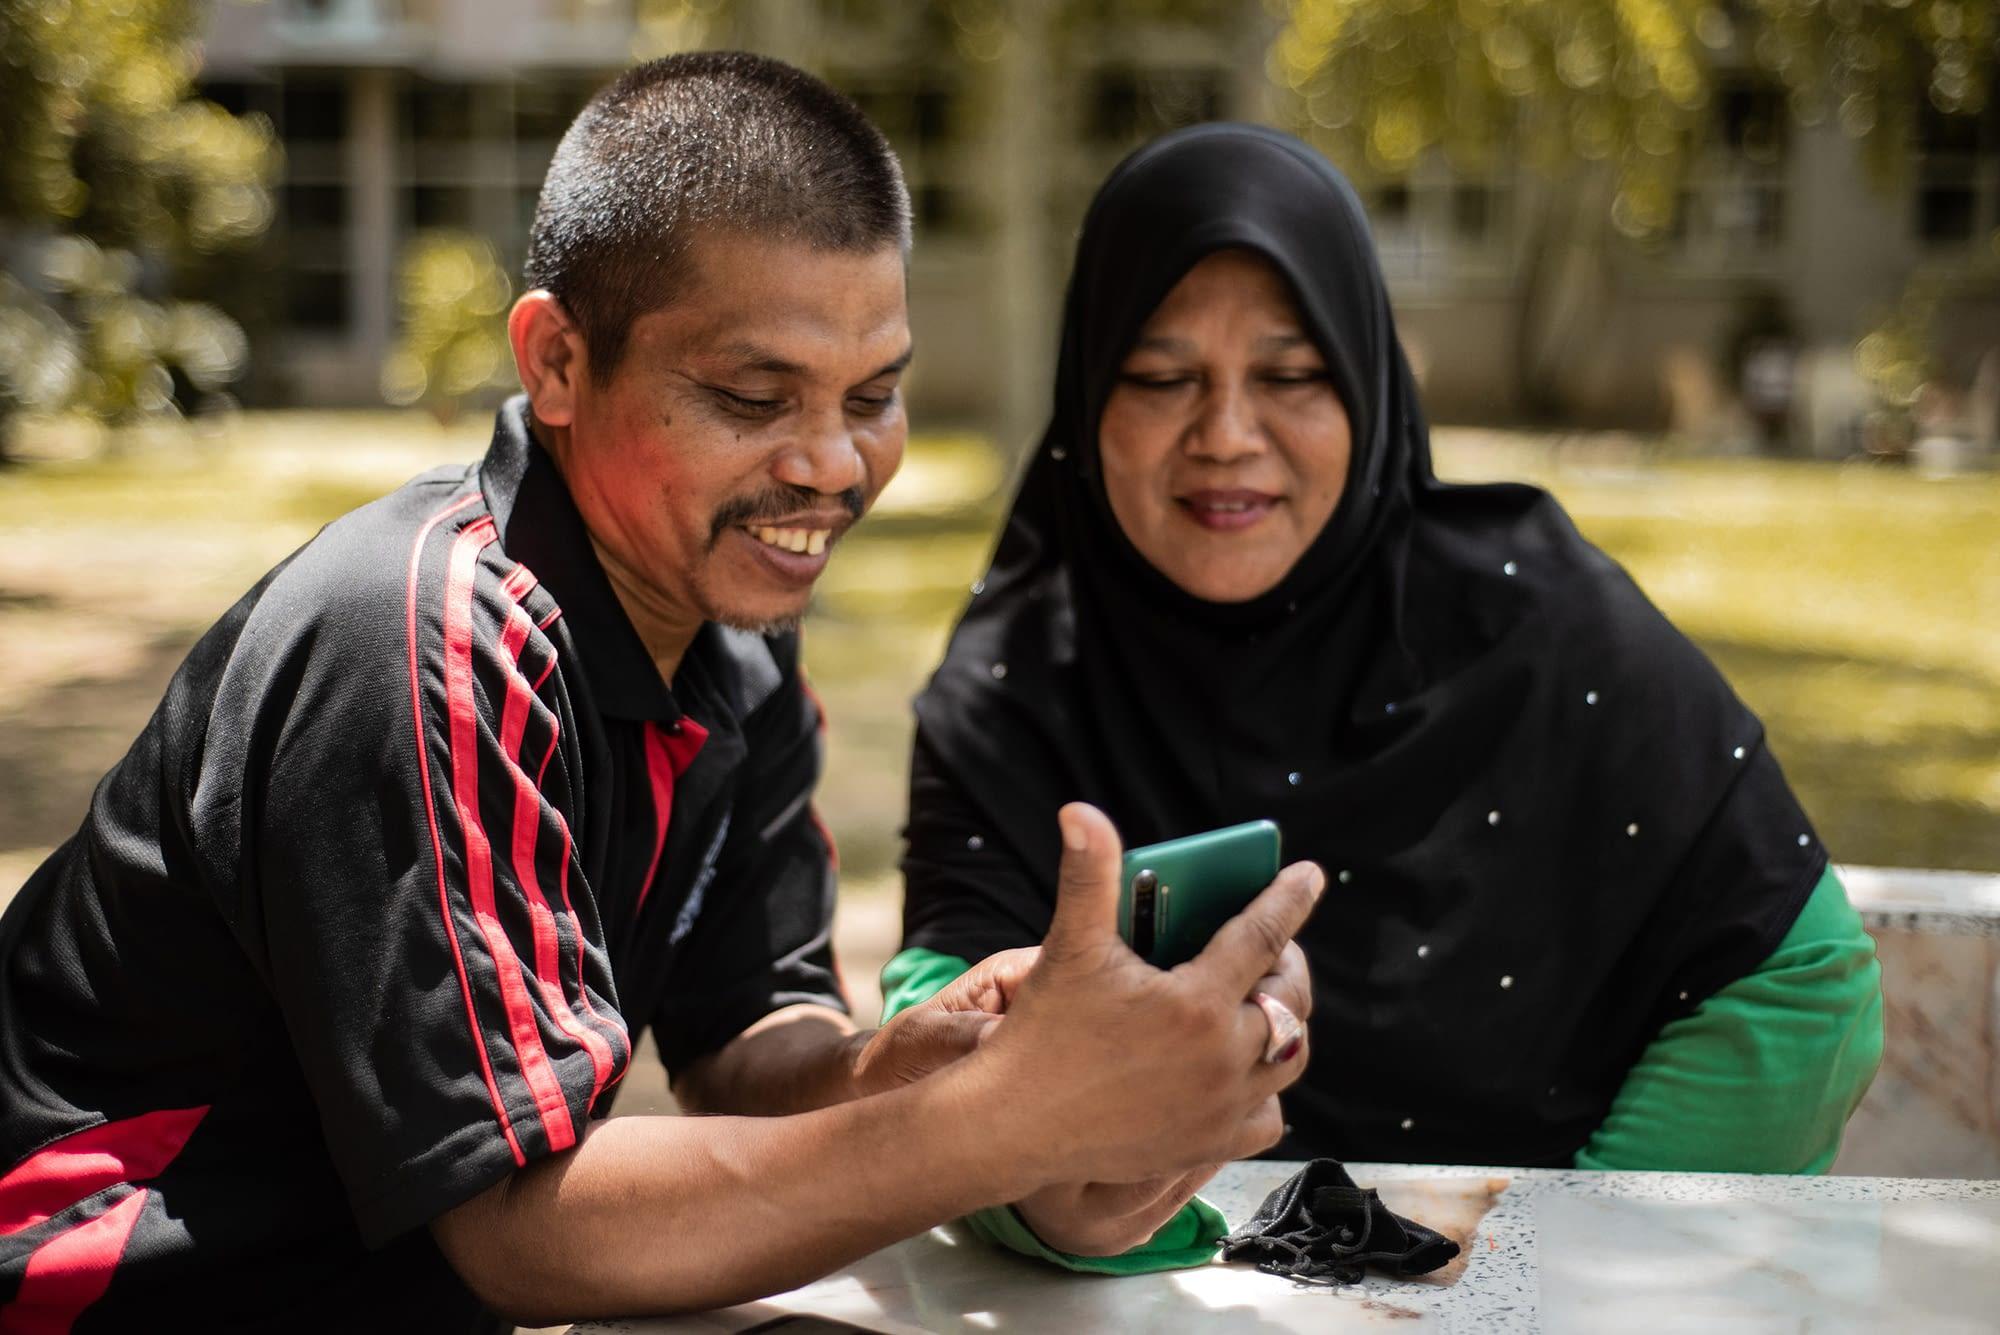 Man and woman looking at a phone